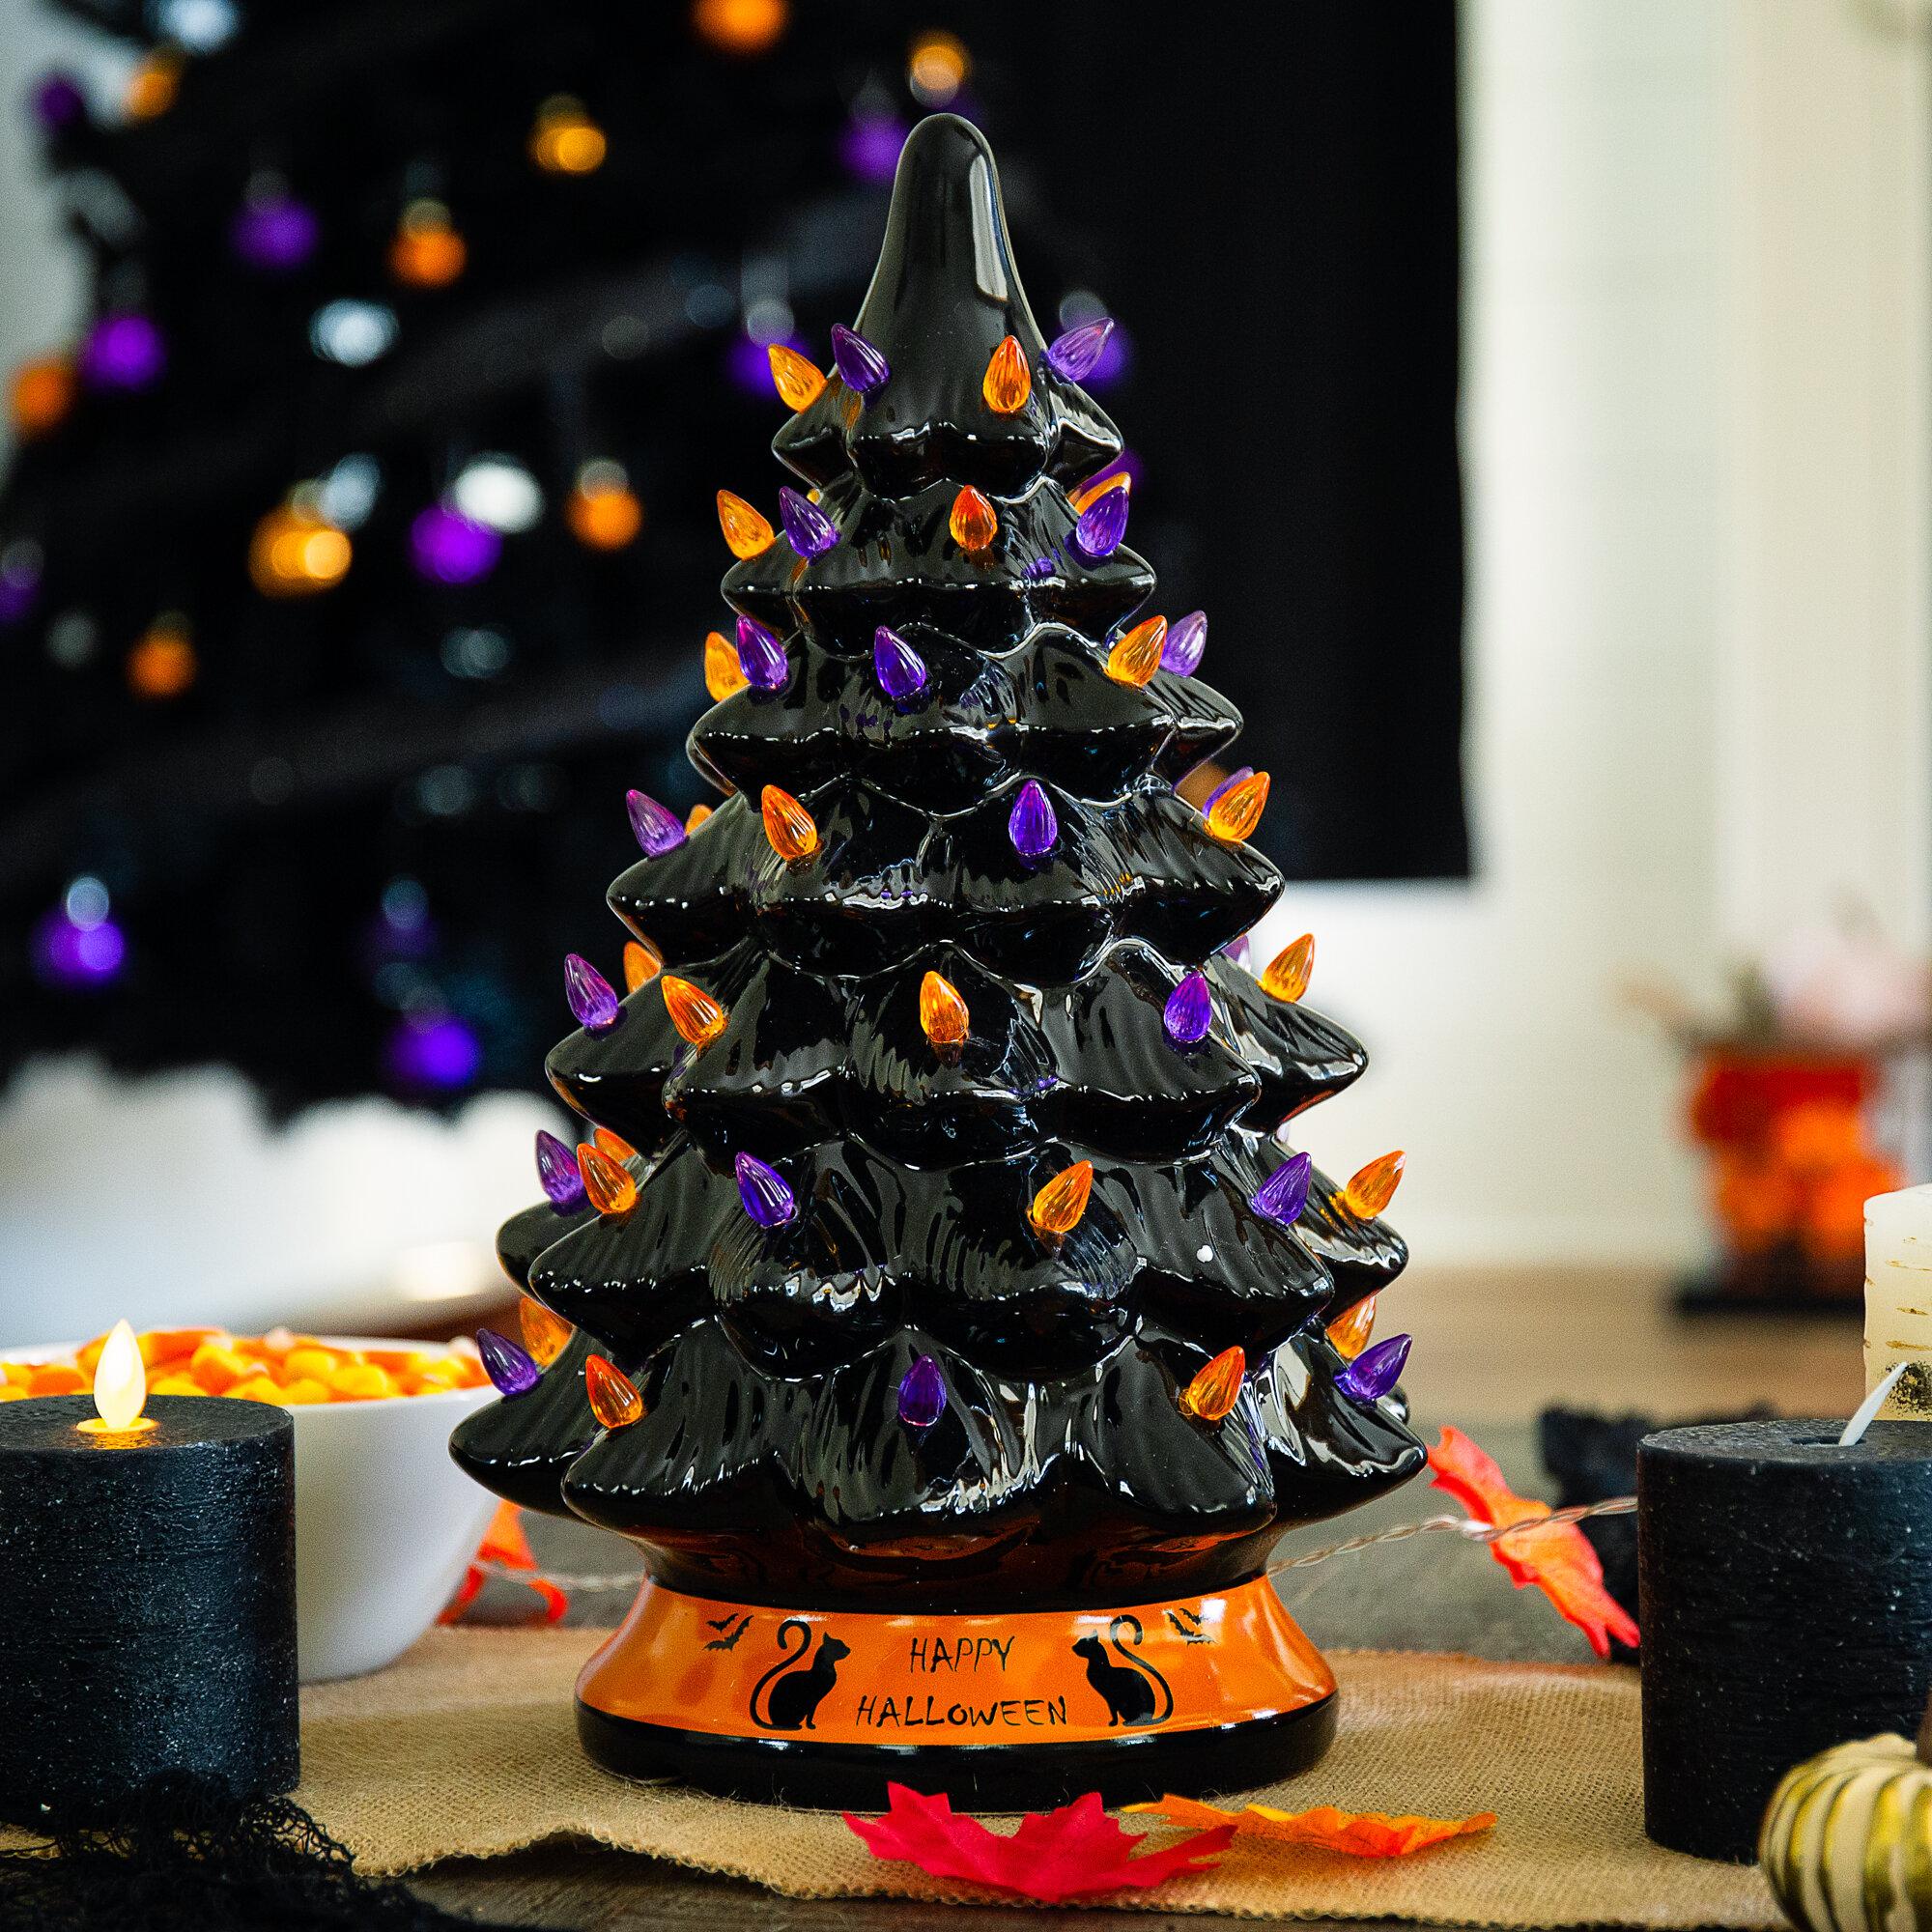 The Holiday Aisle Pre Lit 15in Ceramic Halloween Tree Holiday Decoration W Orange Purple Bulb Lights Reviews Wayfair